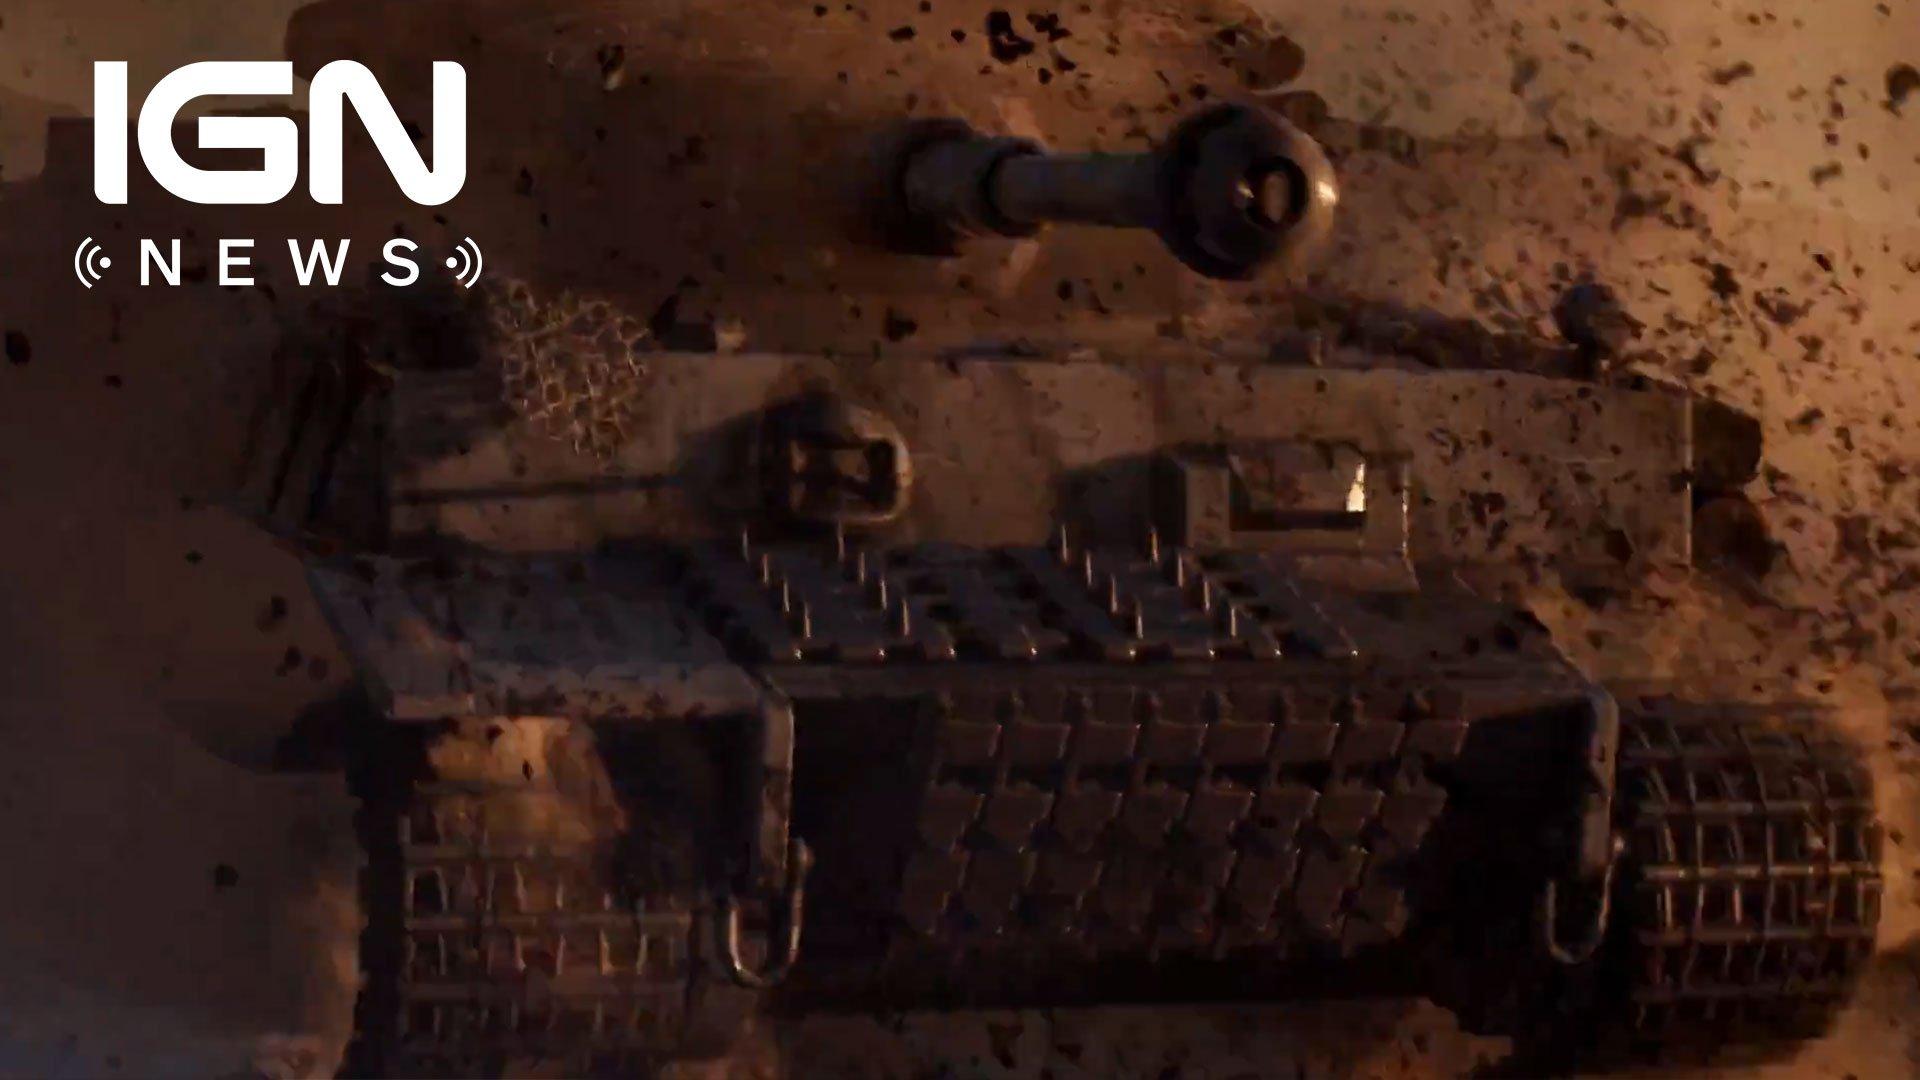 Battlefield 5 Features a 'German Perspective' War Story